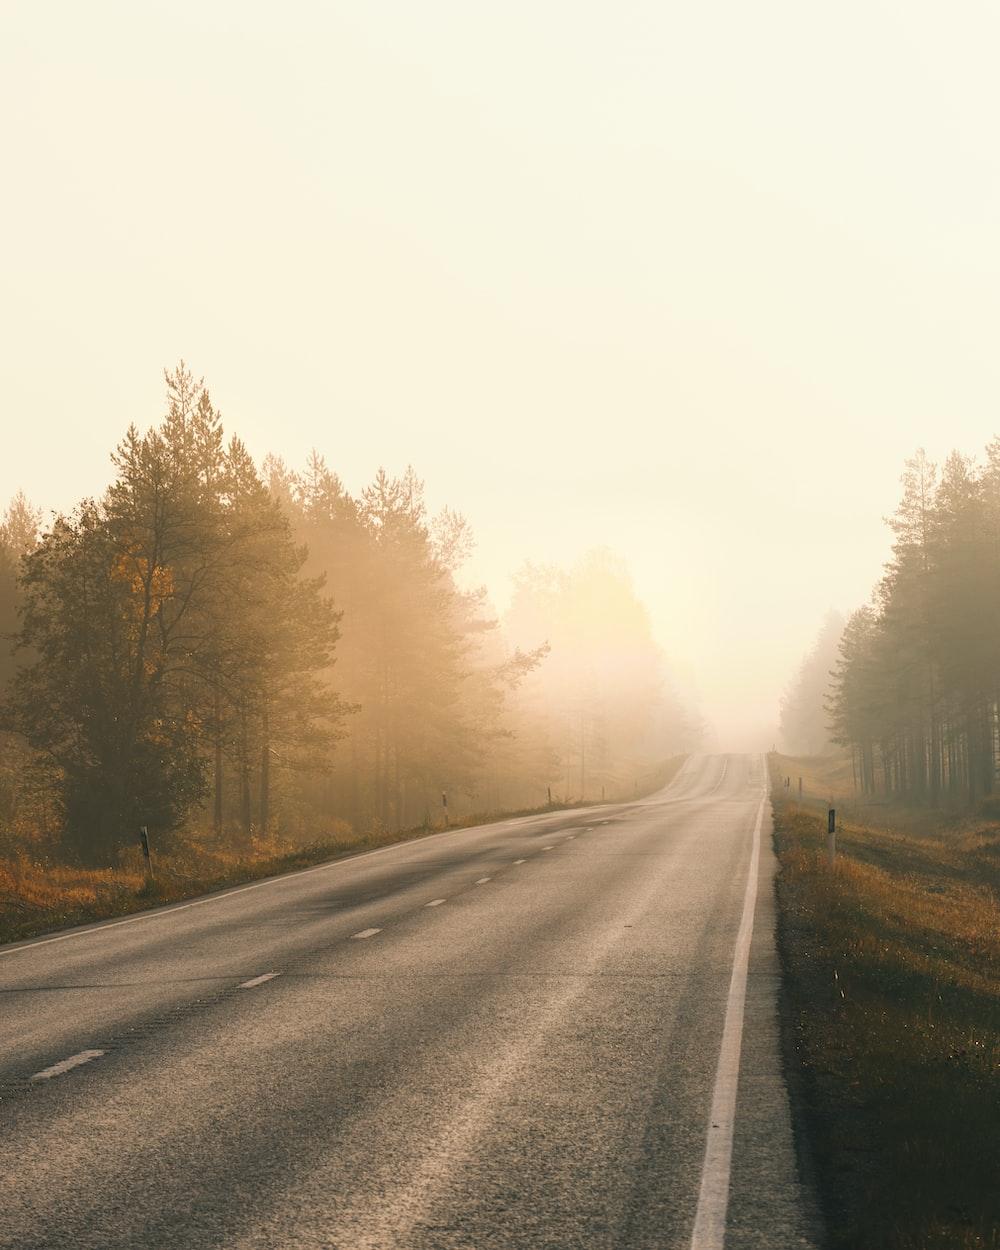 gray asphalt road between trees during daytime